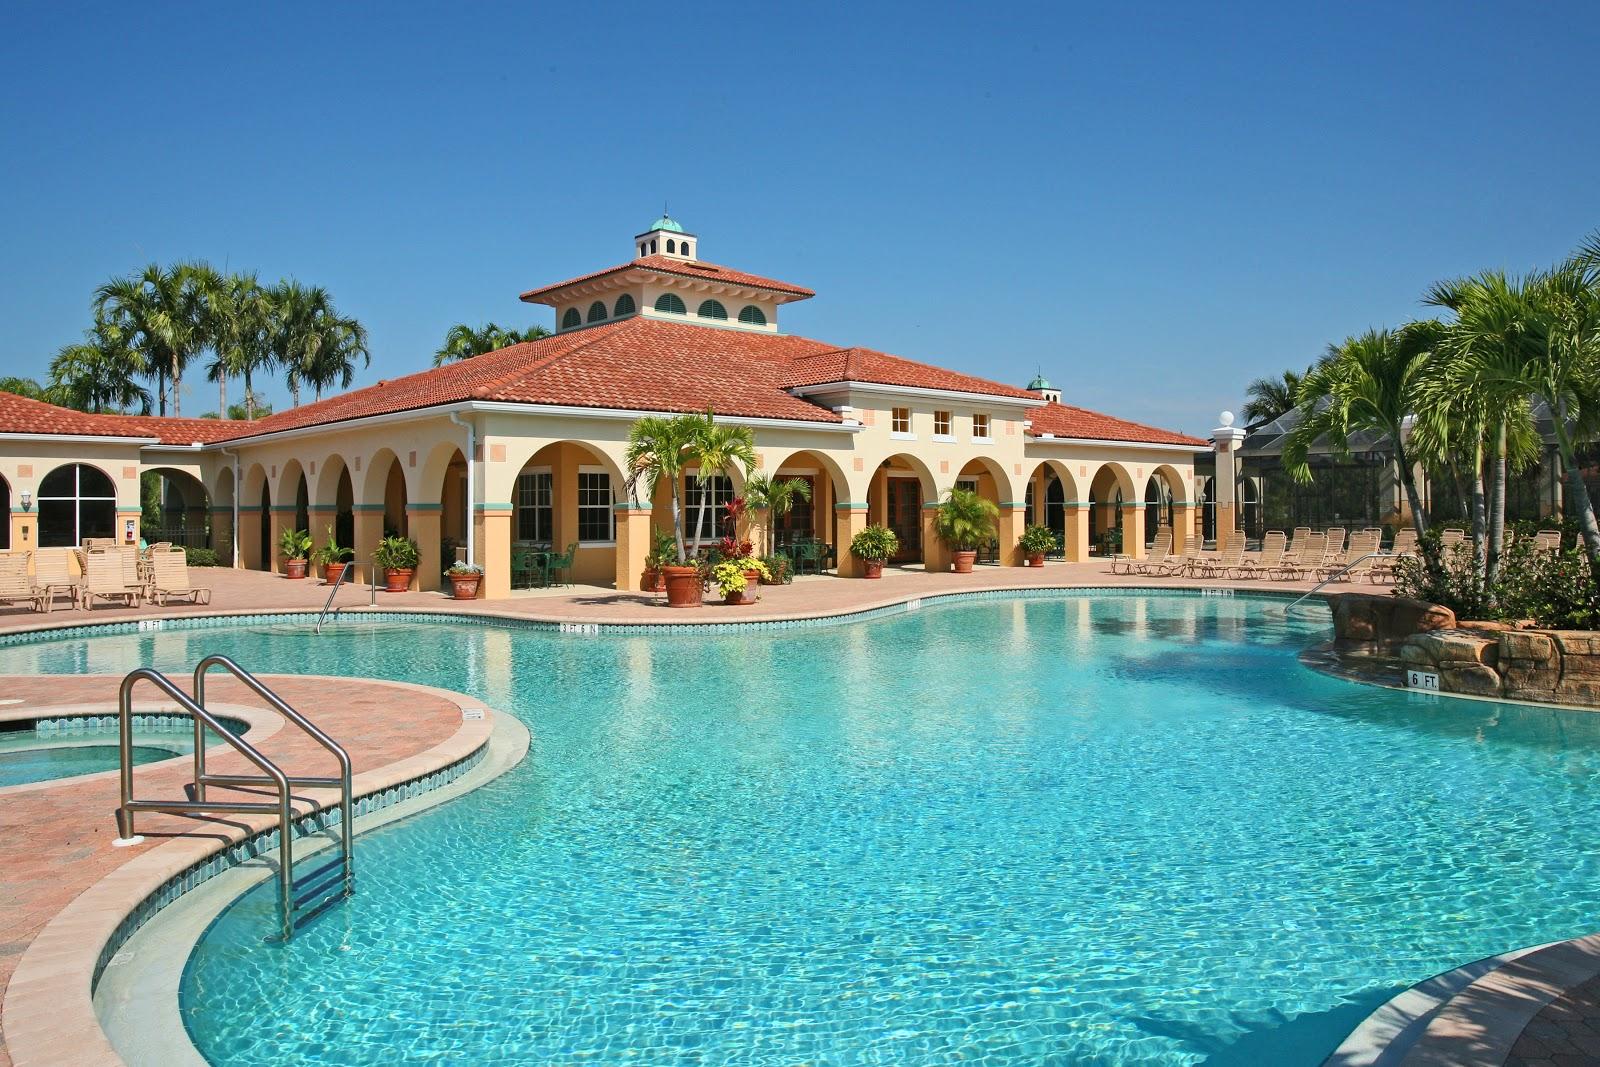 Naples Florida Condo Rentals: Naples, Florida Real Estate